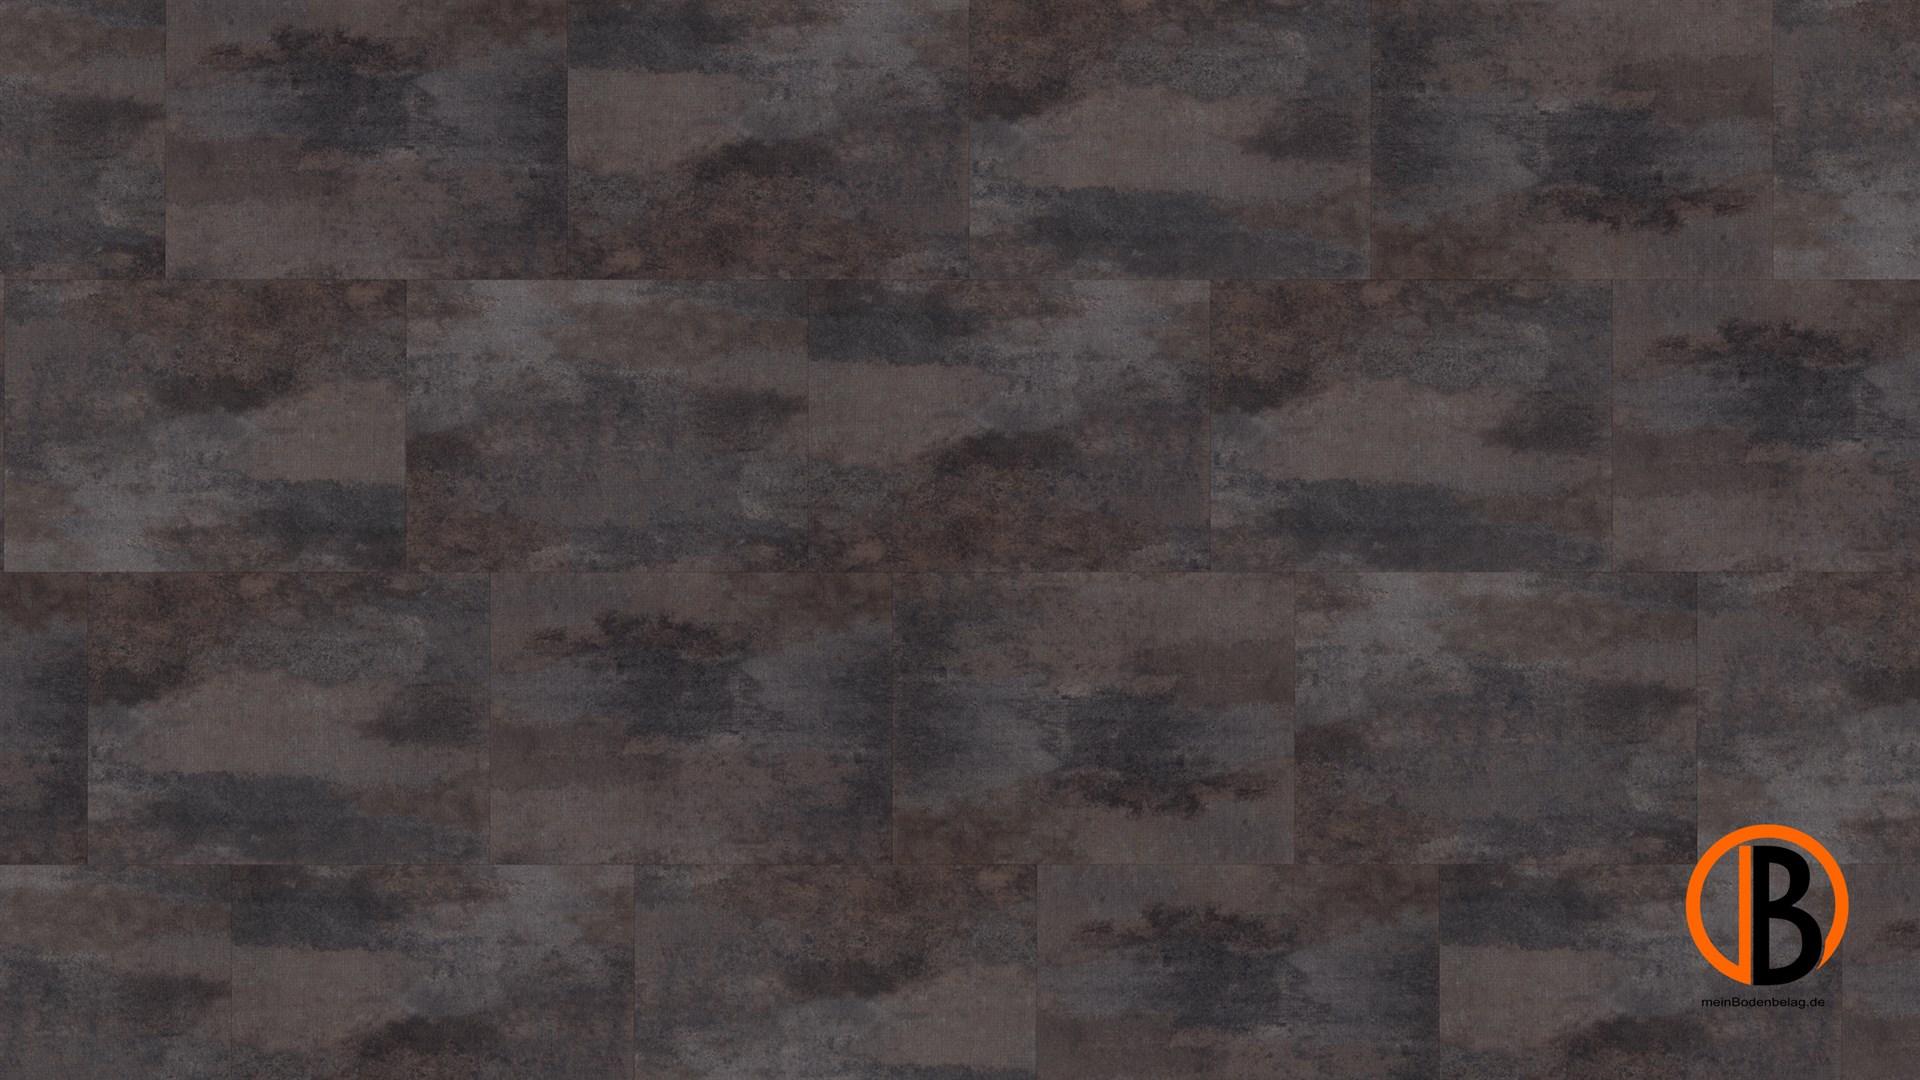 CINQUE KWG DESIGNERVINYL ANTIGUA STONE SHEETS | 10000315;0 | Bild 1